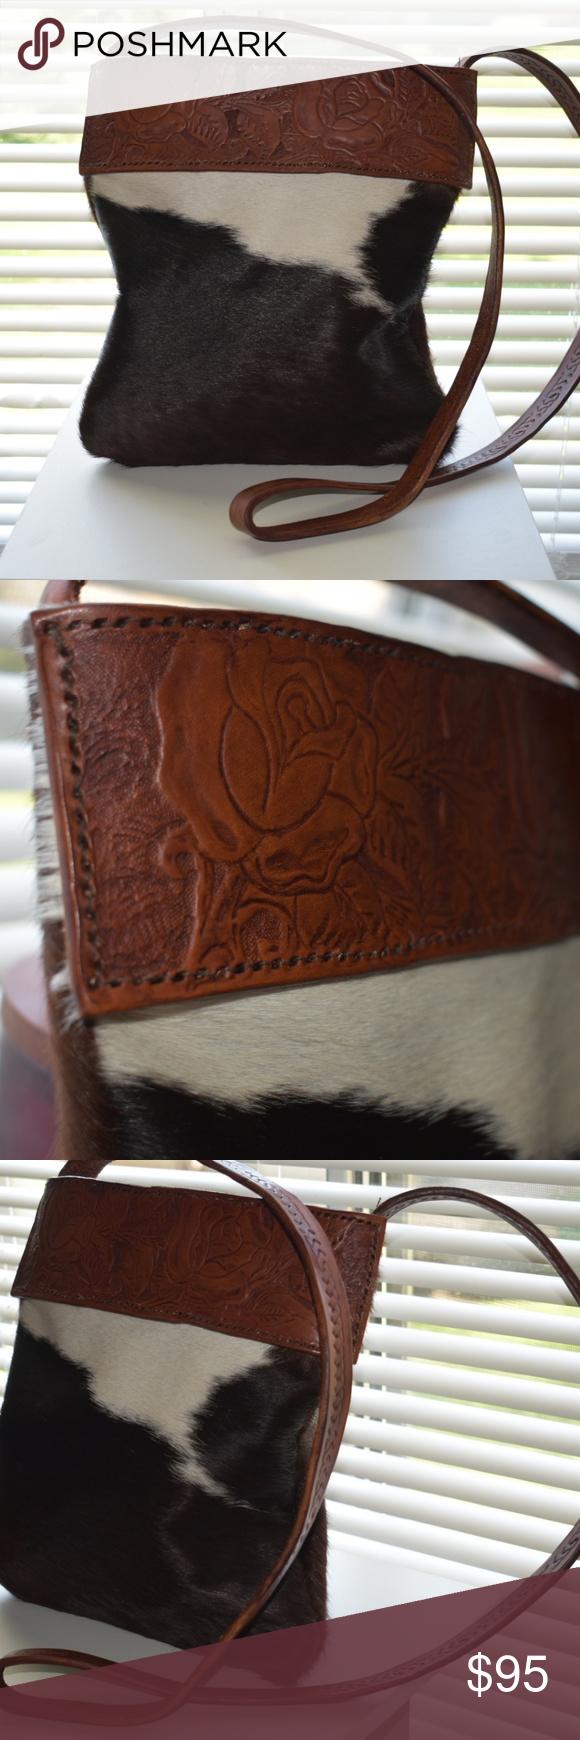 The Roxy bag Handmade Cowhide Crossbody